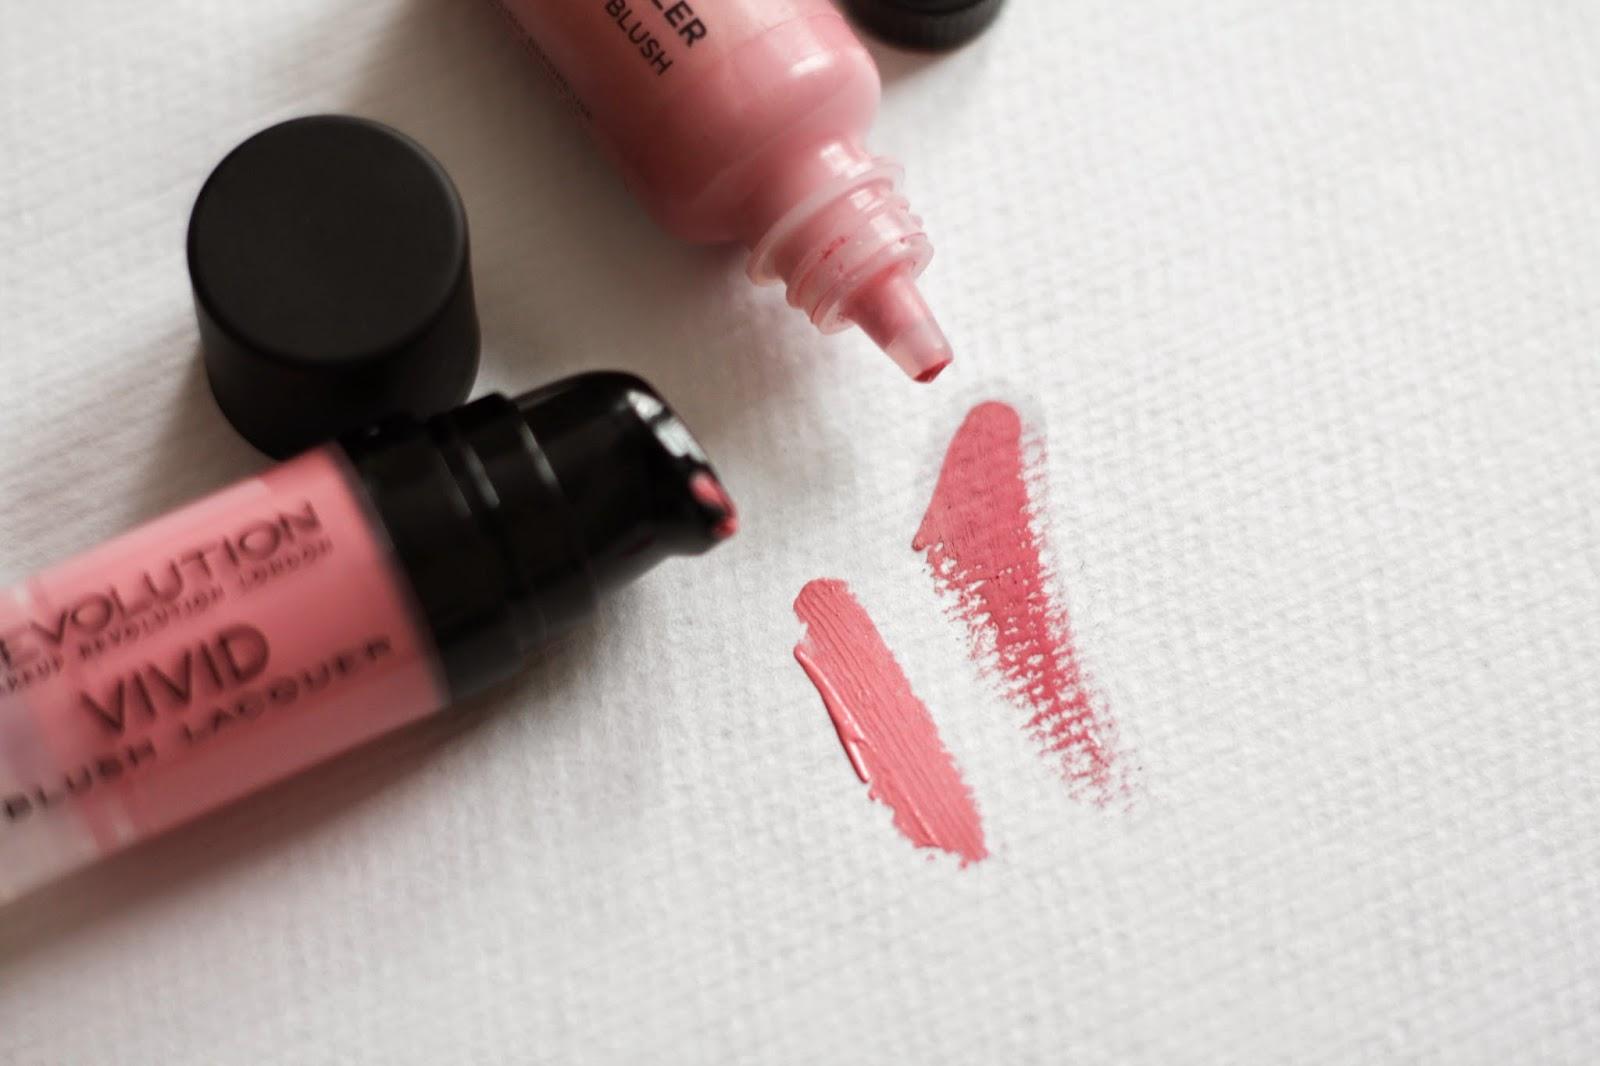 Daniel Sandler Watercolour blush in Flush dupe